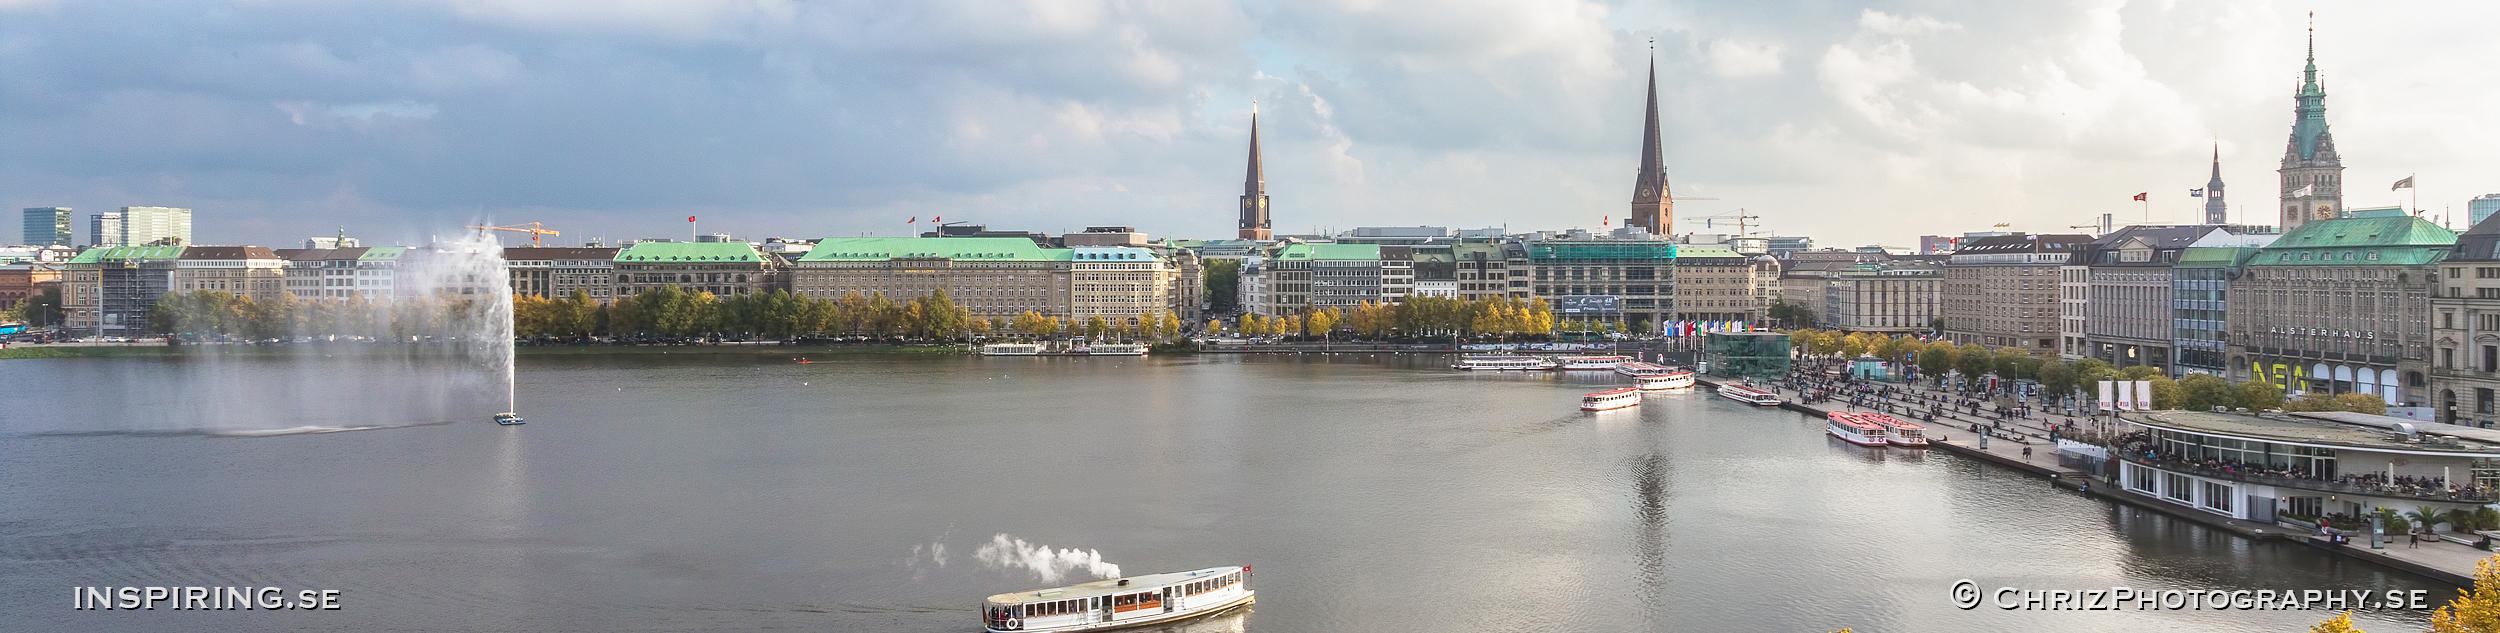 Fairmont_HotelVierJahreszeiten_Hamburg_Inspiring.se_copyright_ChrizPhotography.se_rep_1